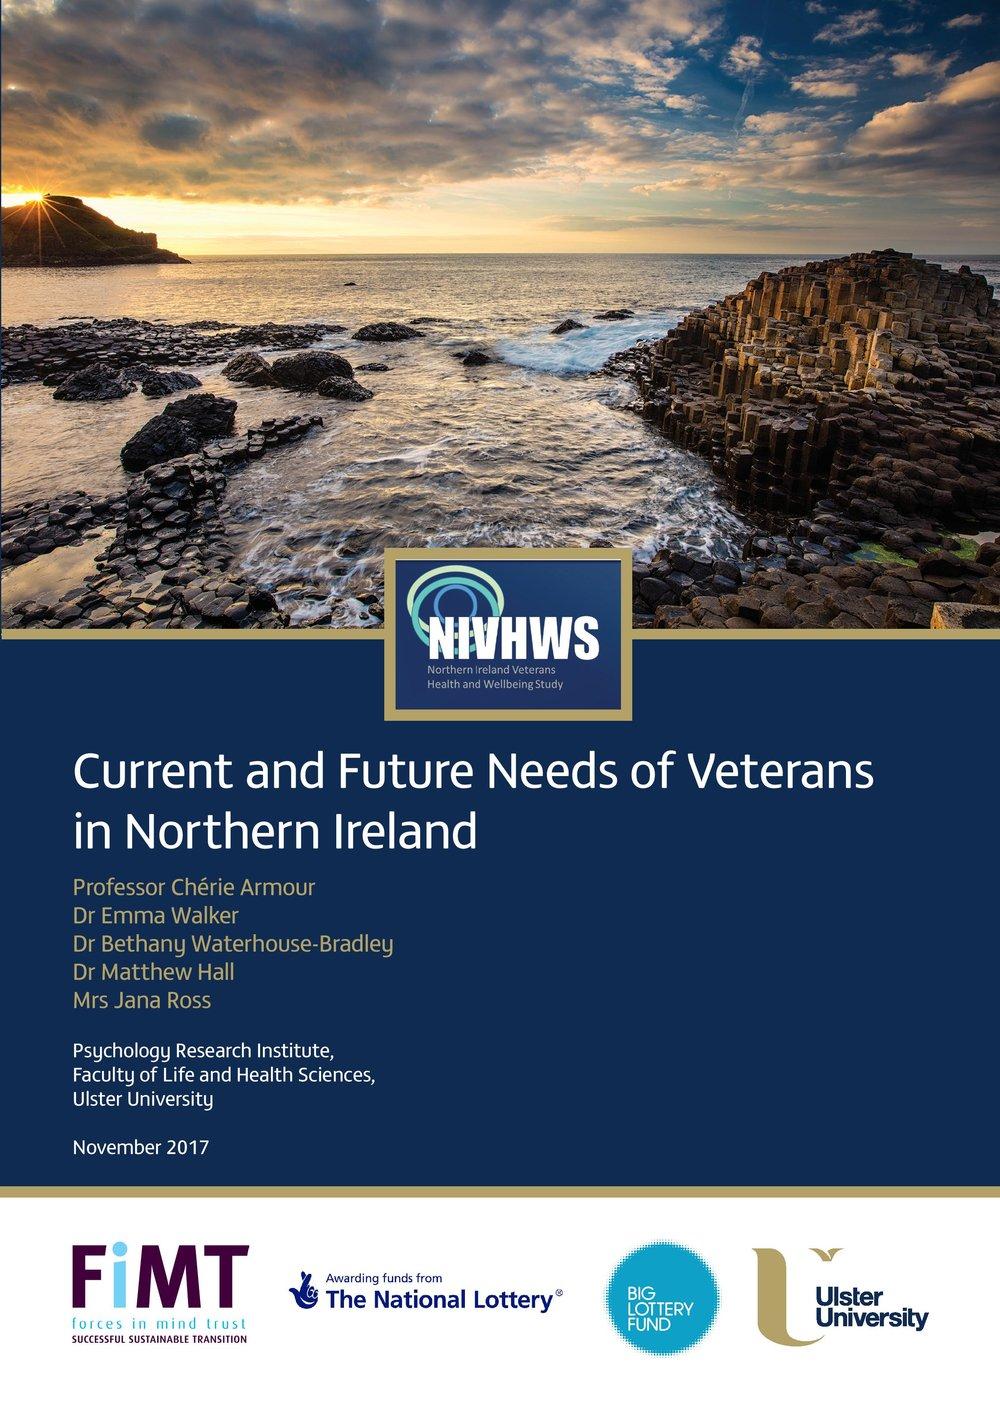 CFN Report Cover_img.jpg